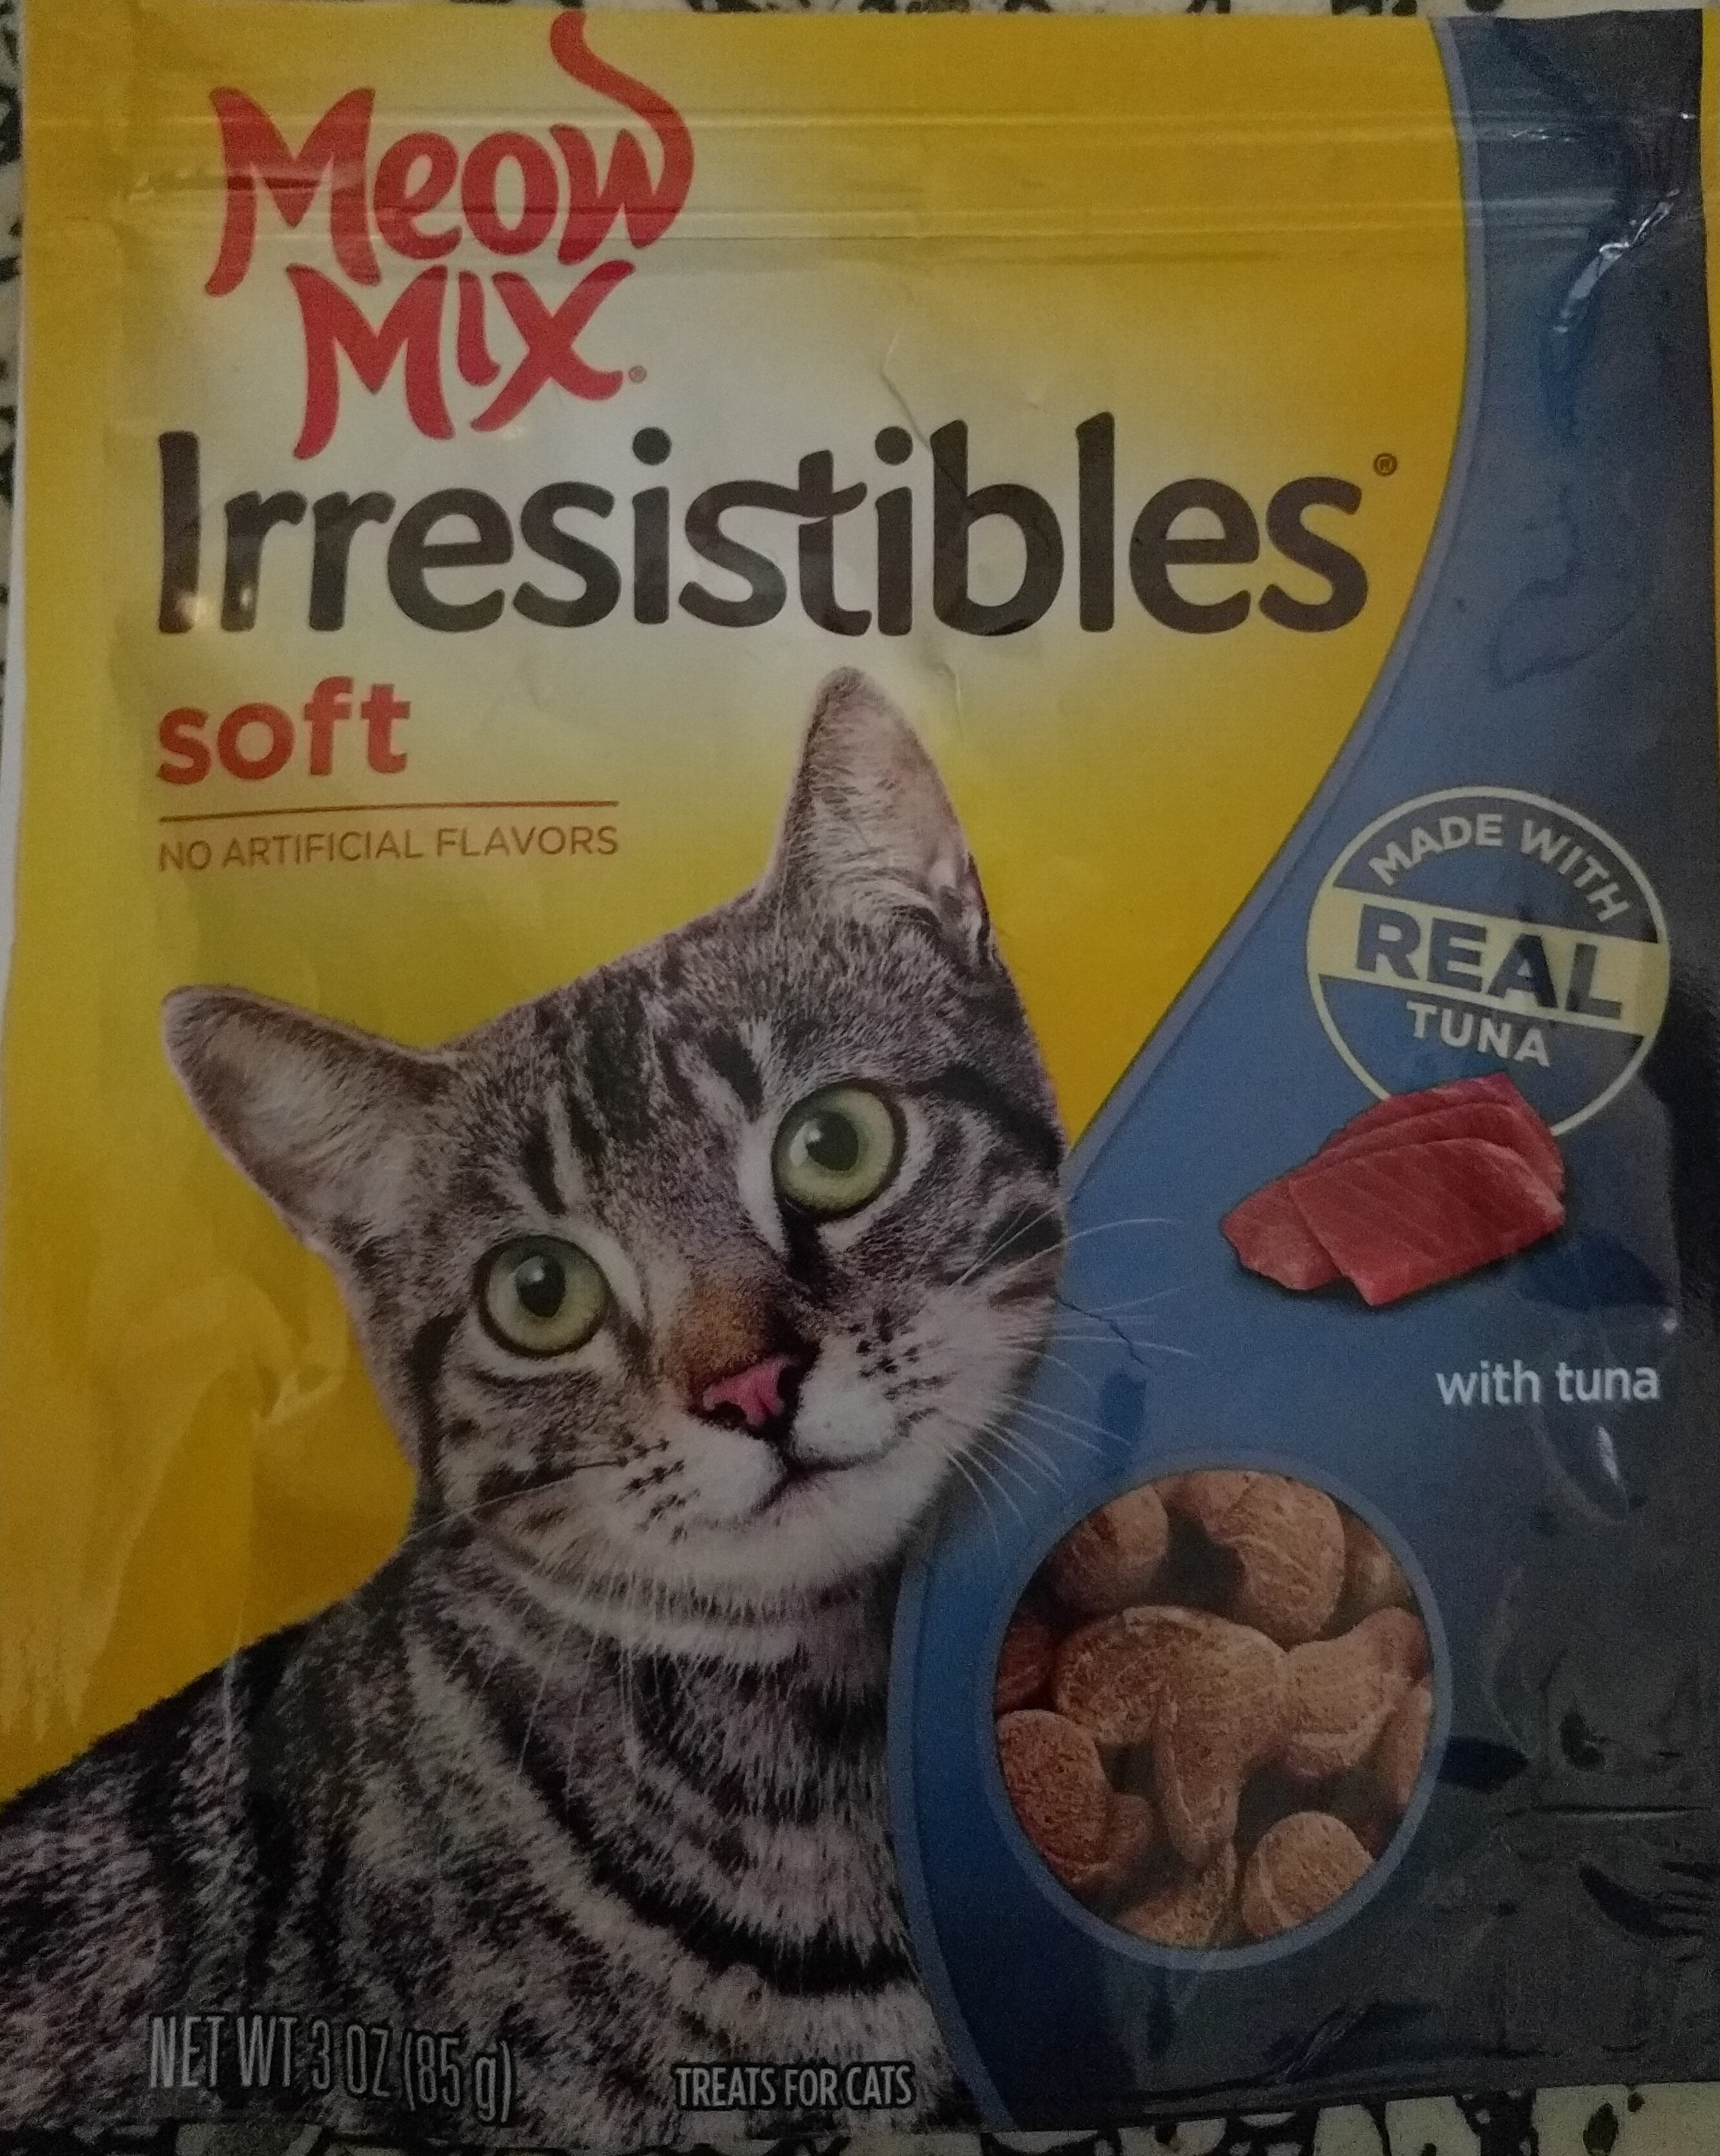 Meow Mix Irresistables - soft - Product - en